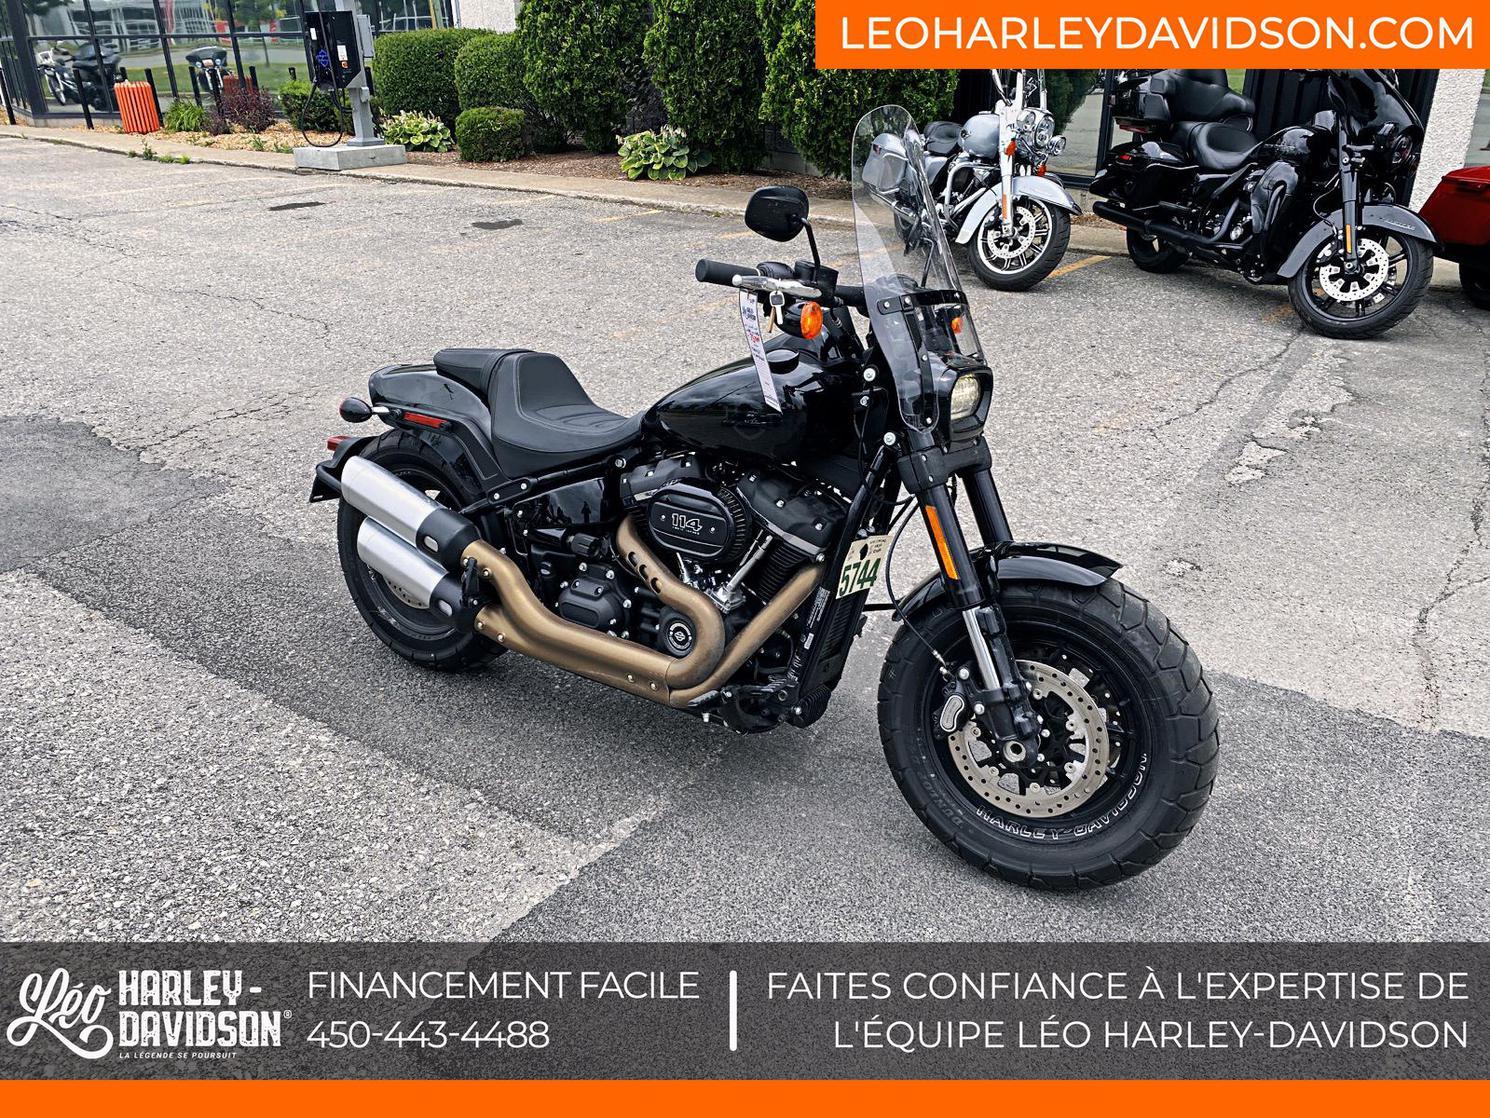 Harley-Davidson ST-Softail-Fat Bob 114 2021 - FXFBS